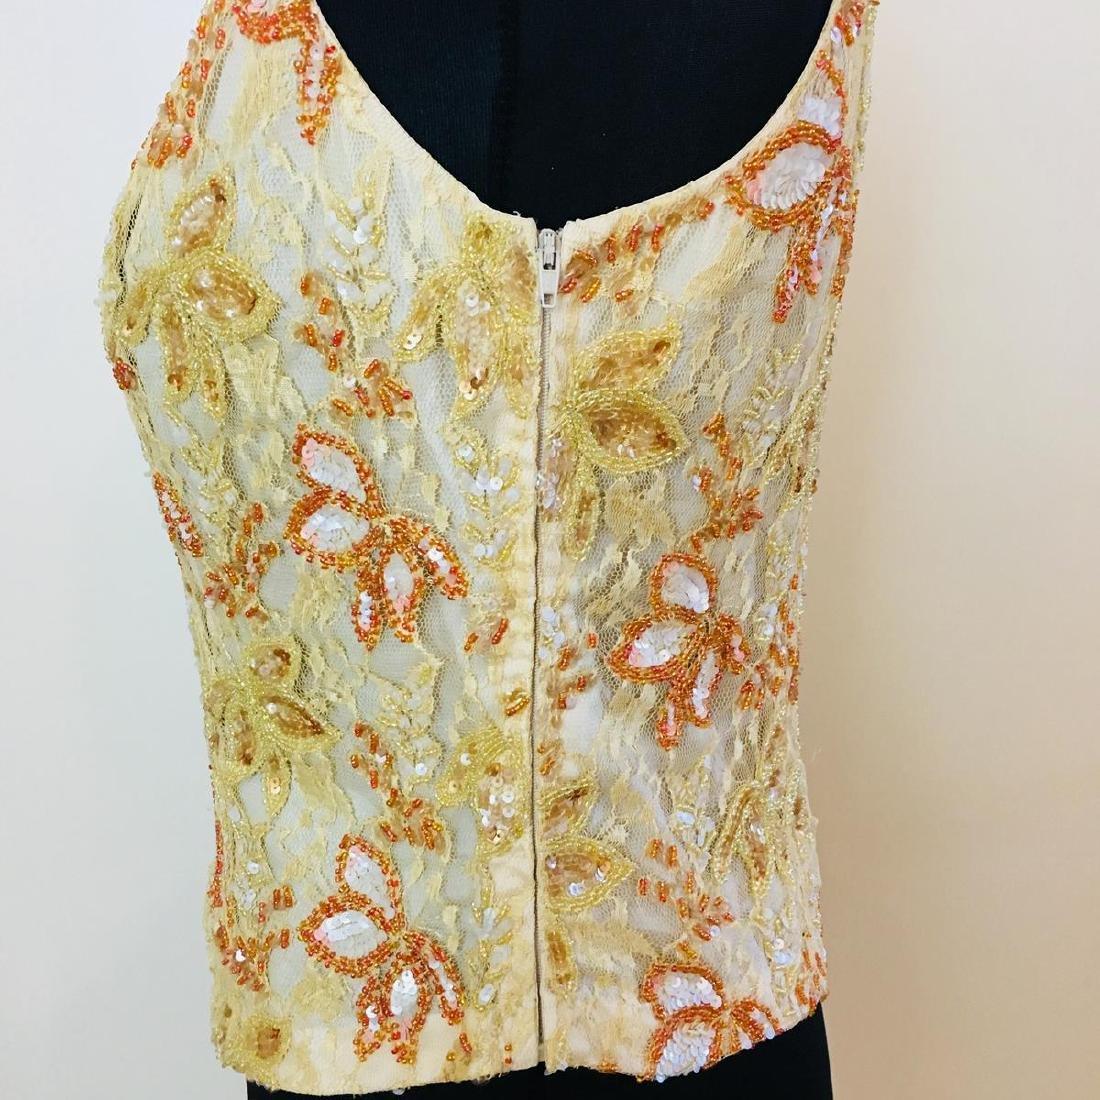 Vintage Women's Collection Designer Blouse Shirt Top - 6